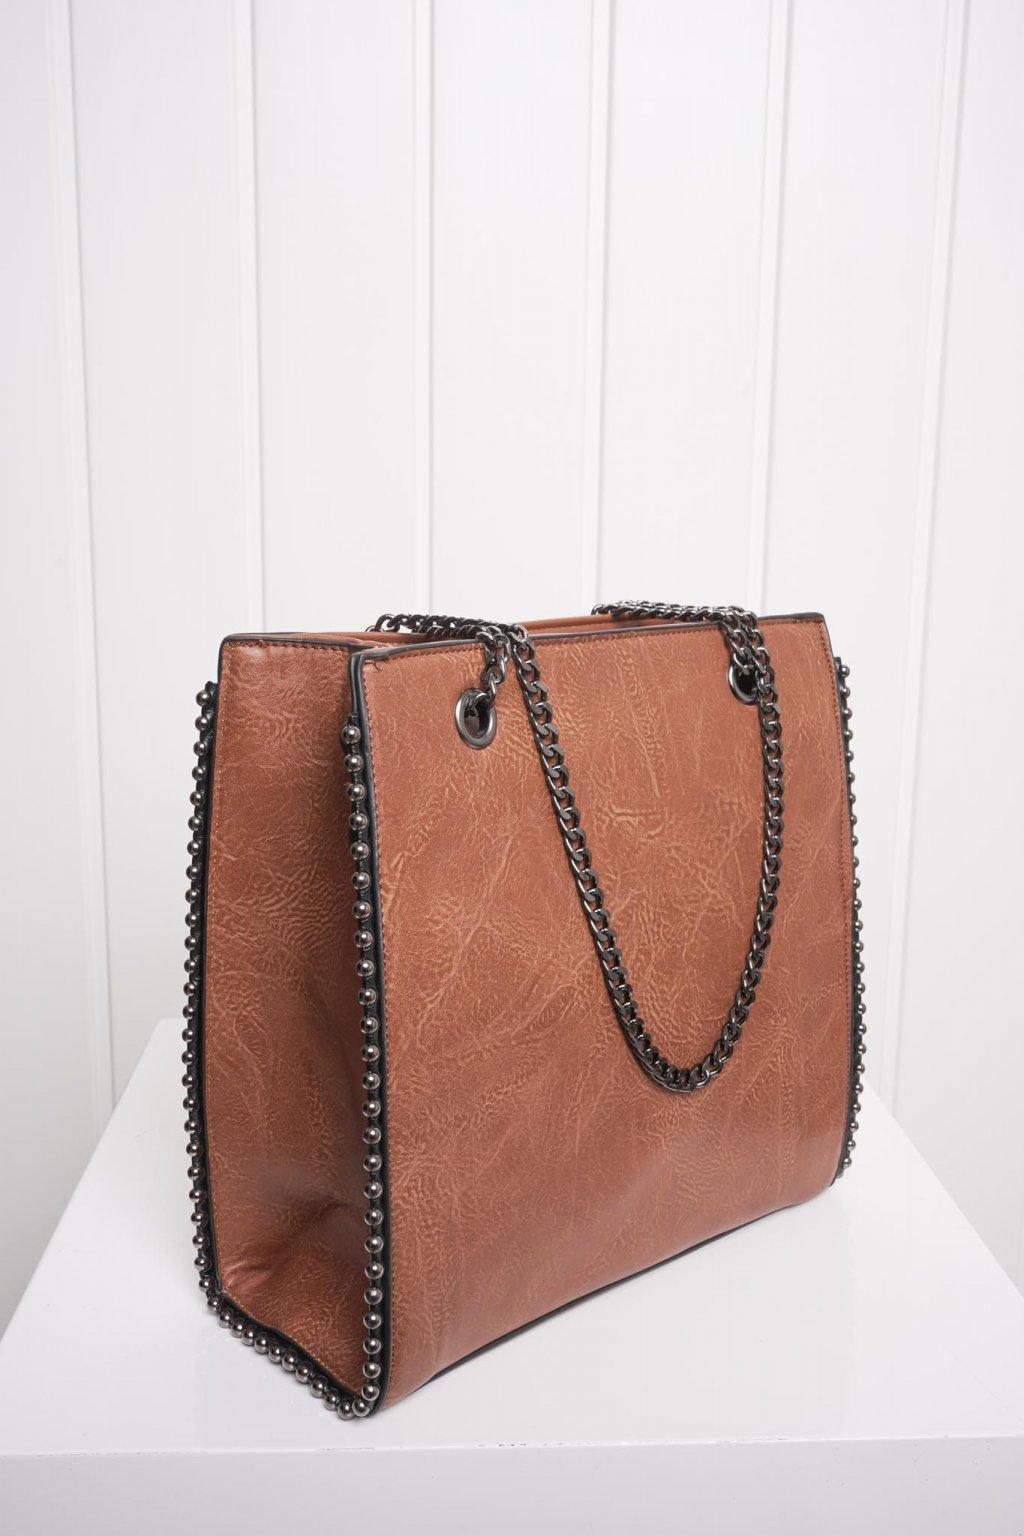 Kabelka, ruksak, dobrá cena, čierna kabelka, čierny ruksak, basic, kabelky, ruksaky 122